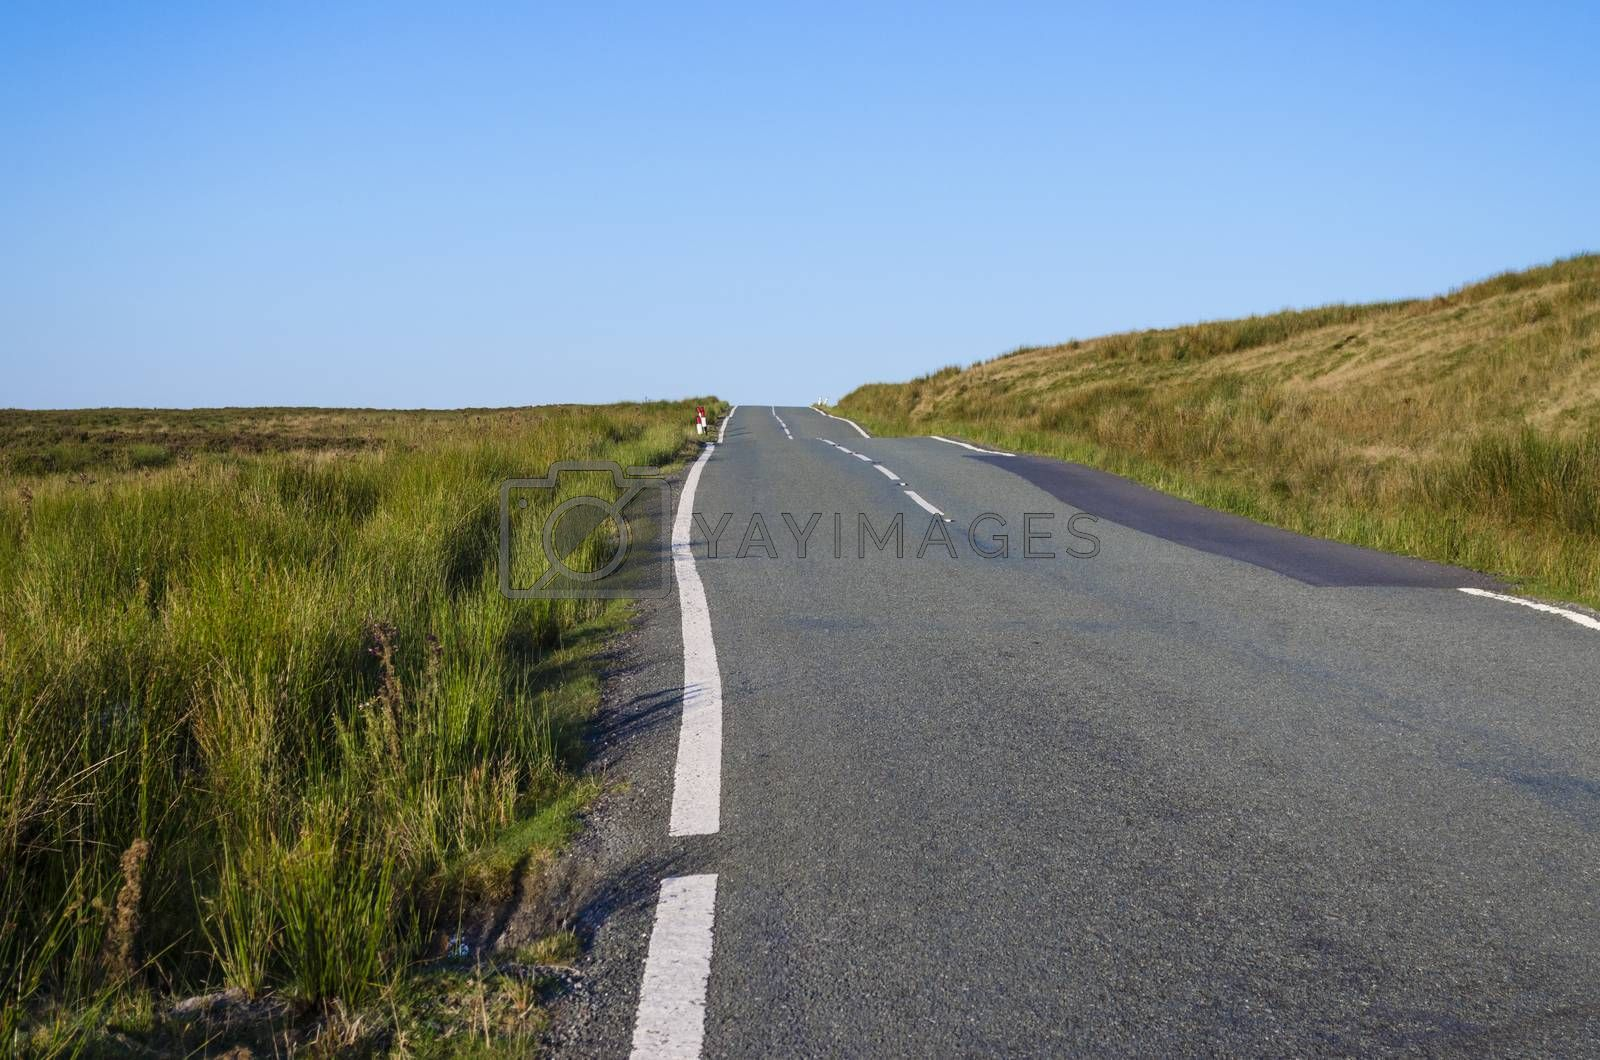 Royalty free image of Country lane across moorland by JohnDavidPhoto